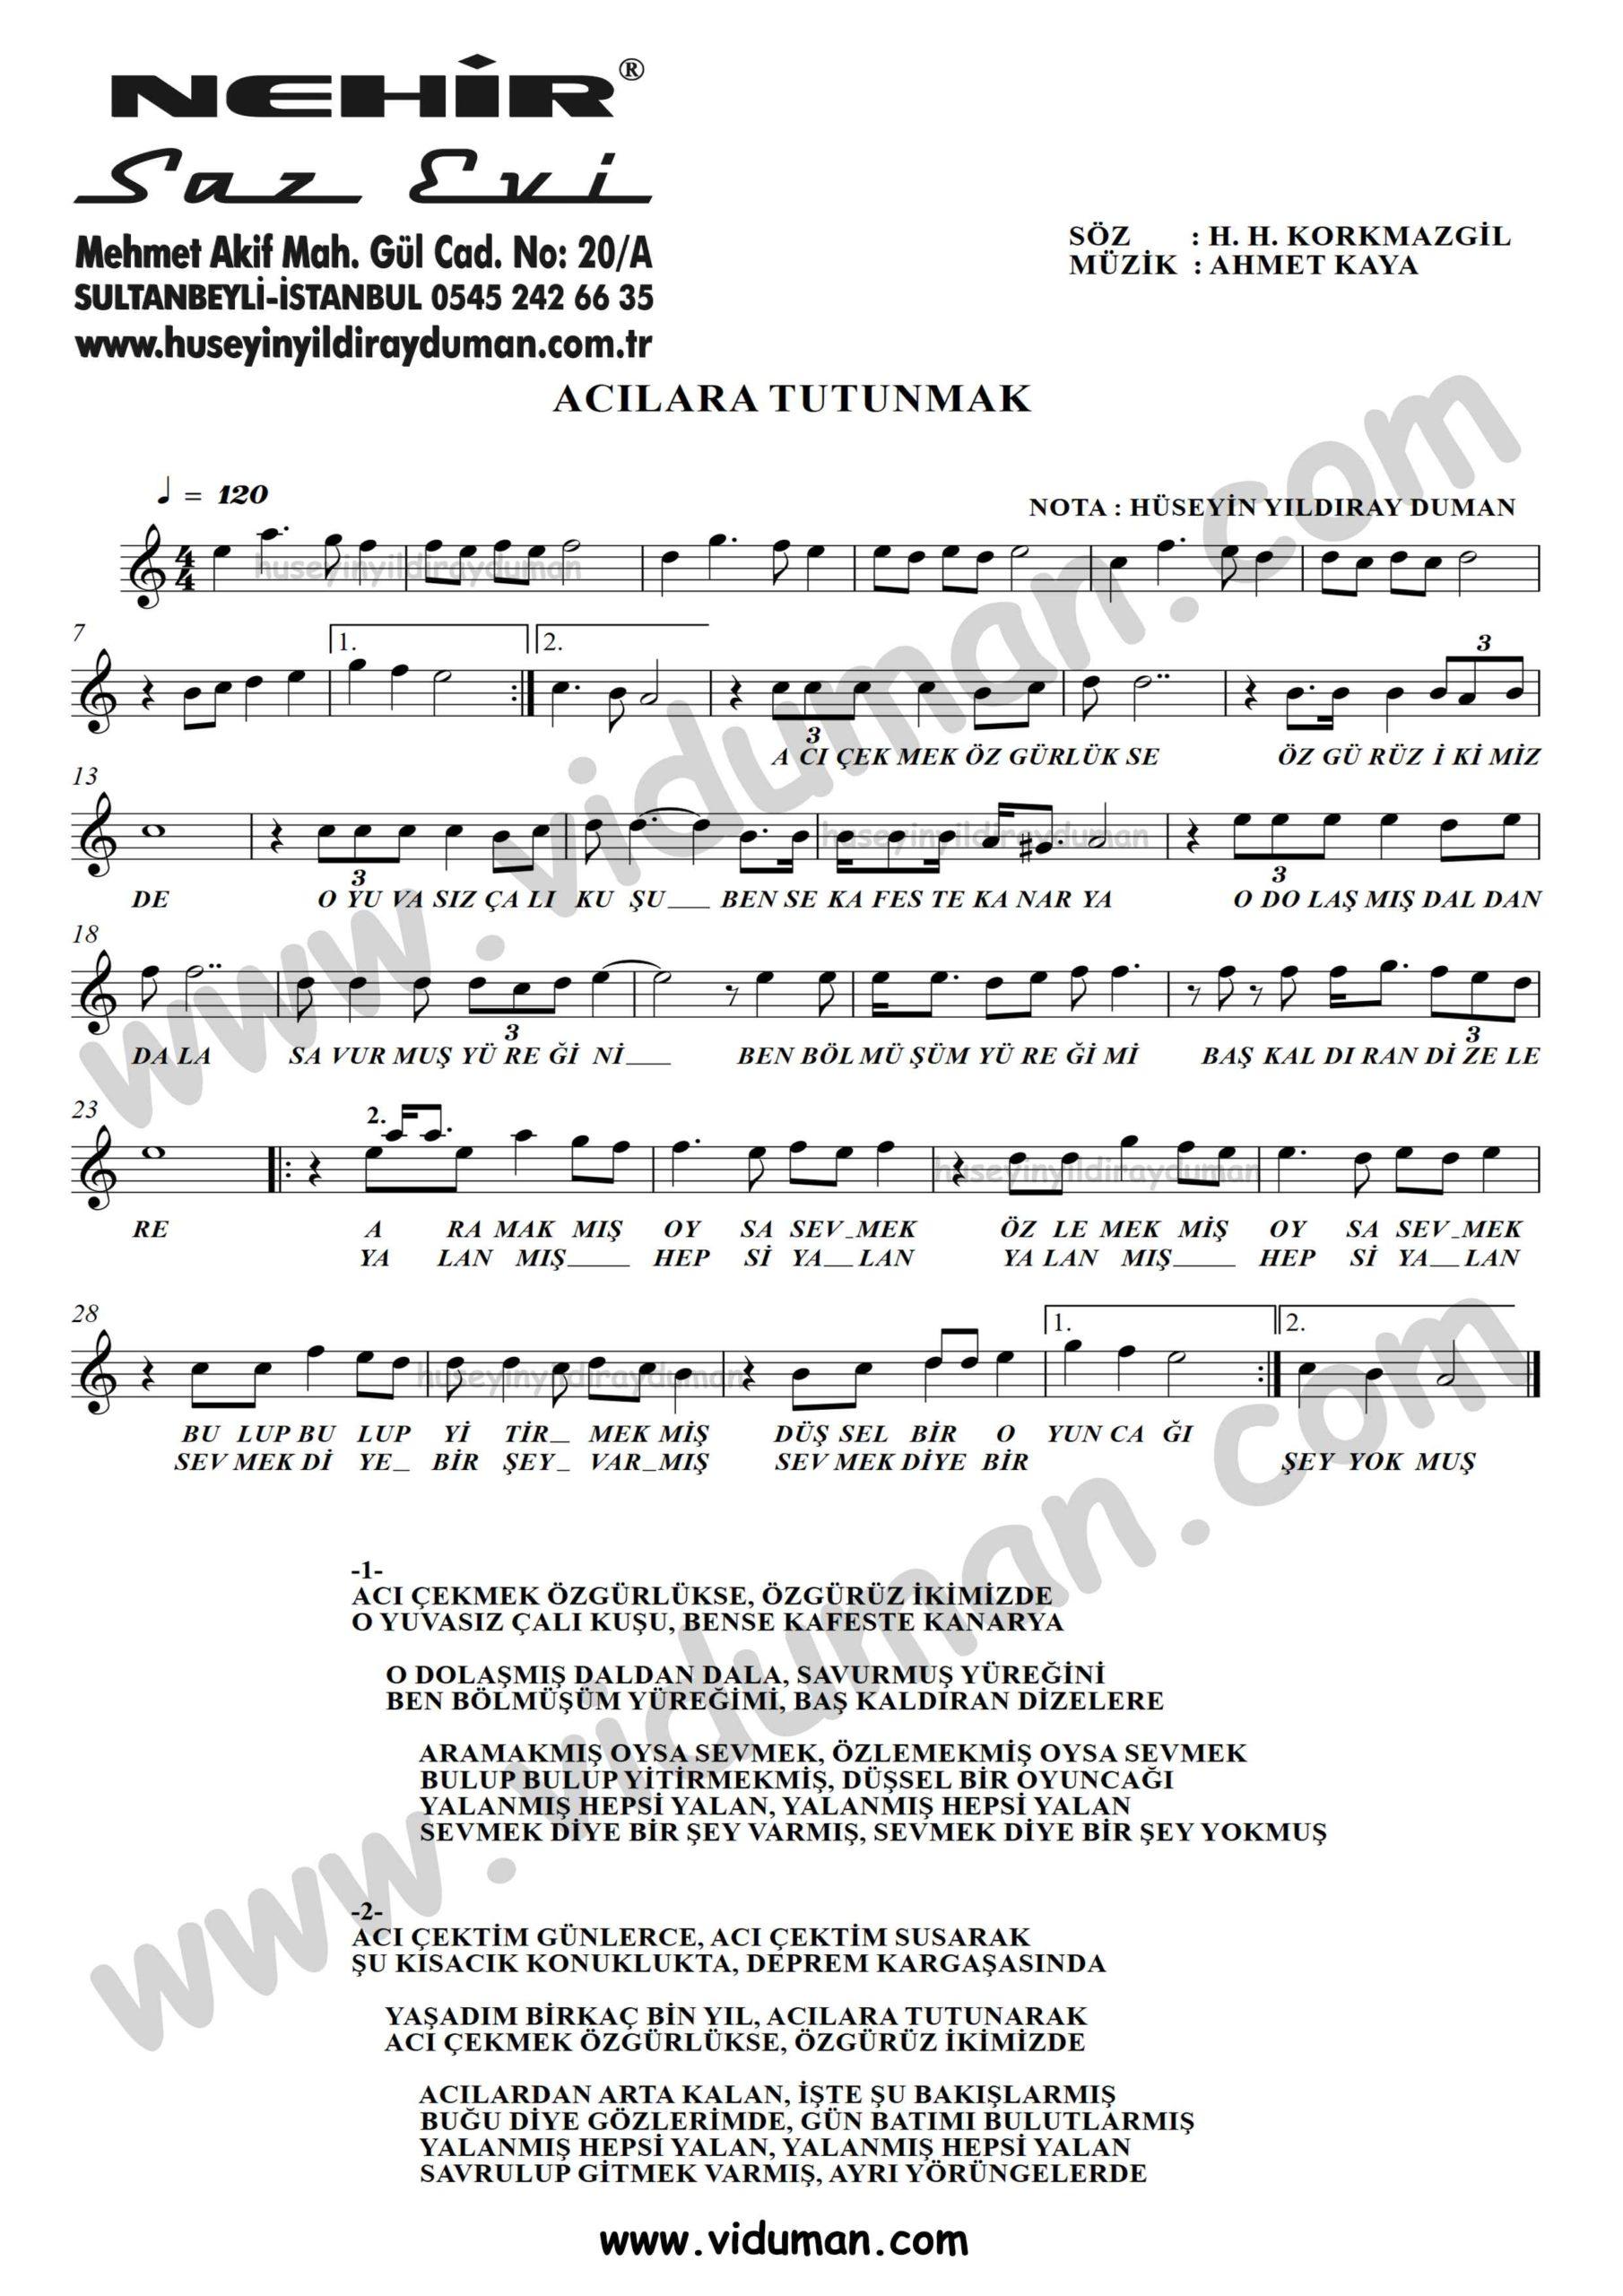 Acilara Tutunmak-Ahmet Kaya-Baglama-Saz-Turku-Notalari